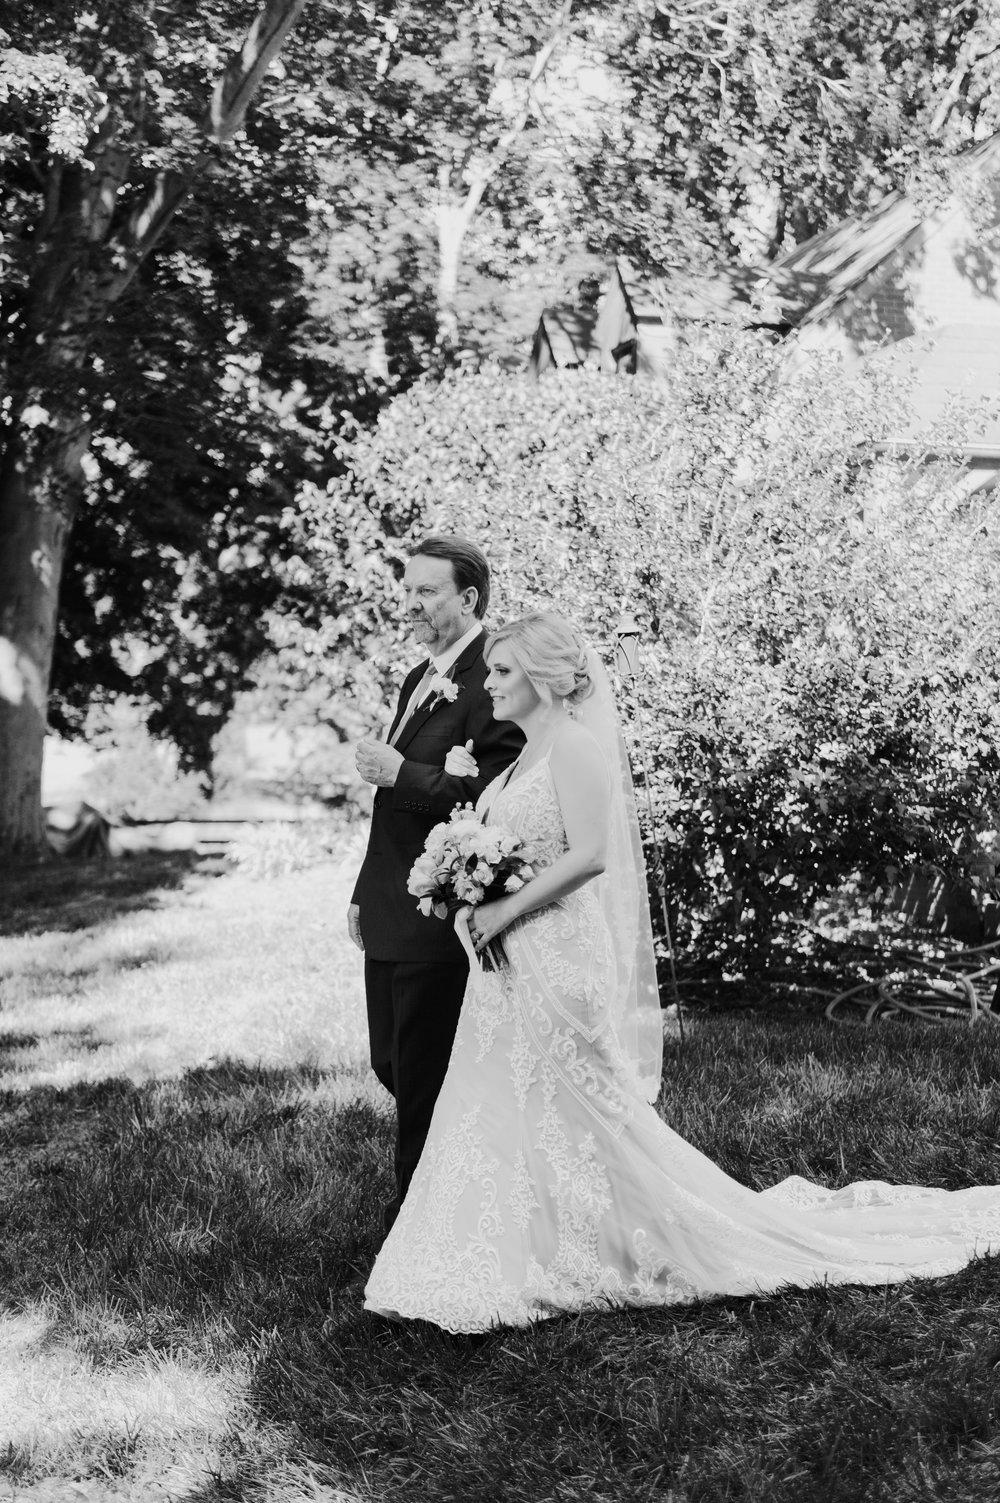 dad-walking-bride-down-the-aisle.jpg